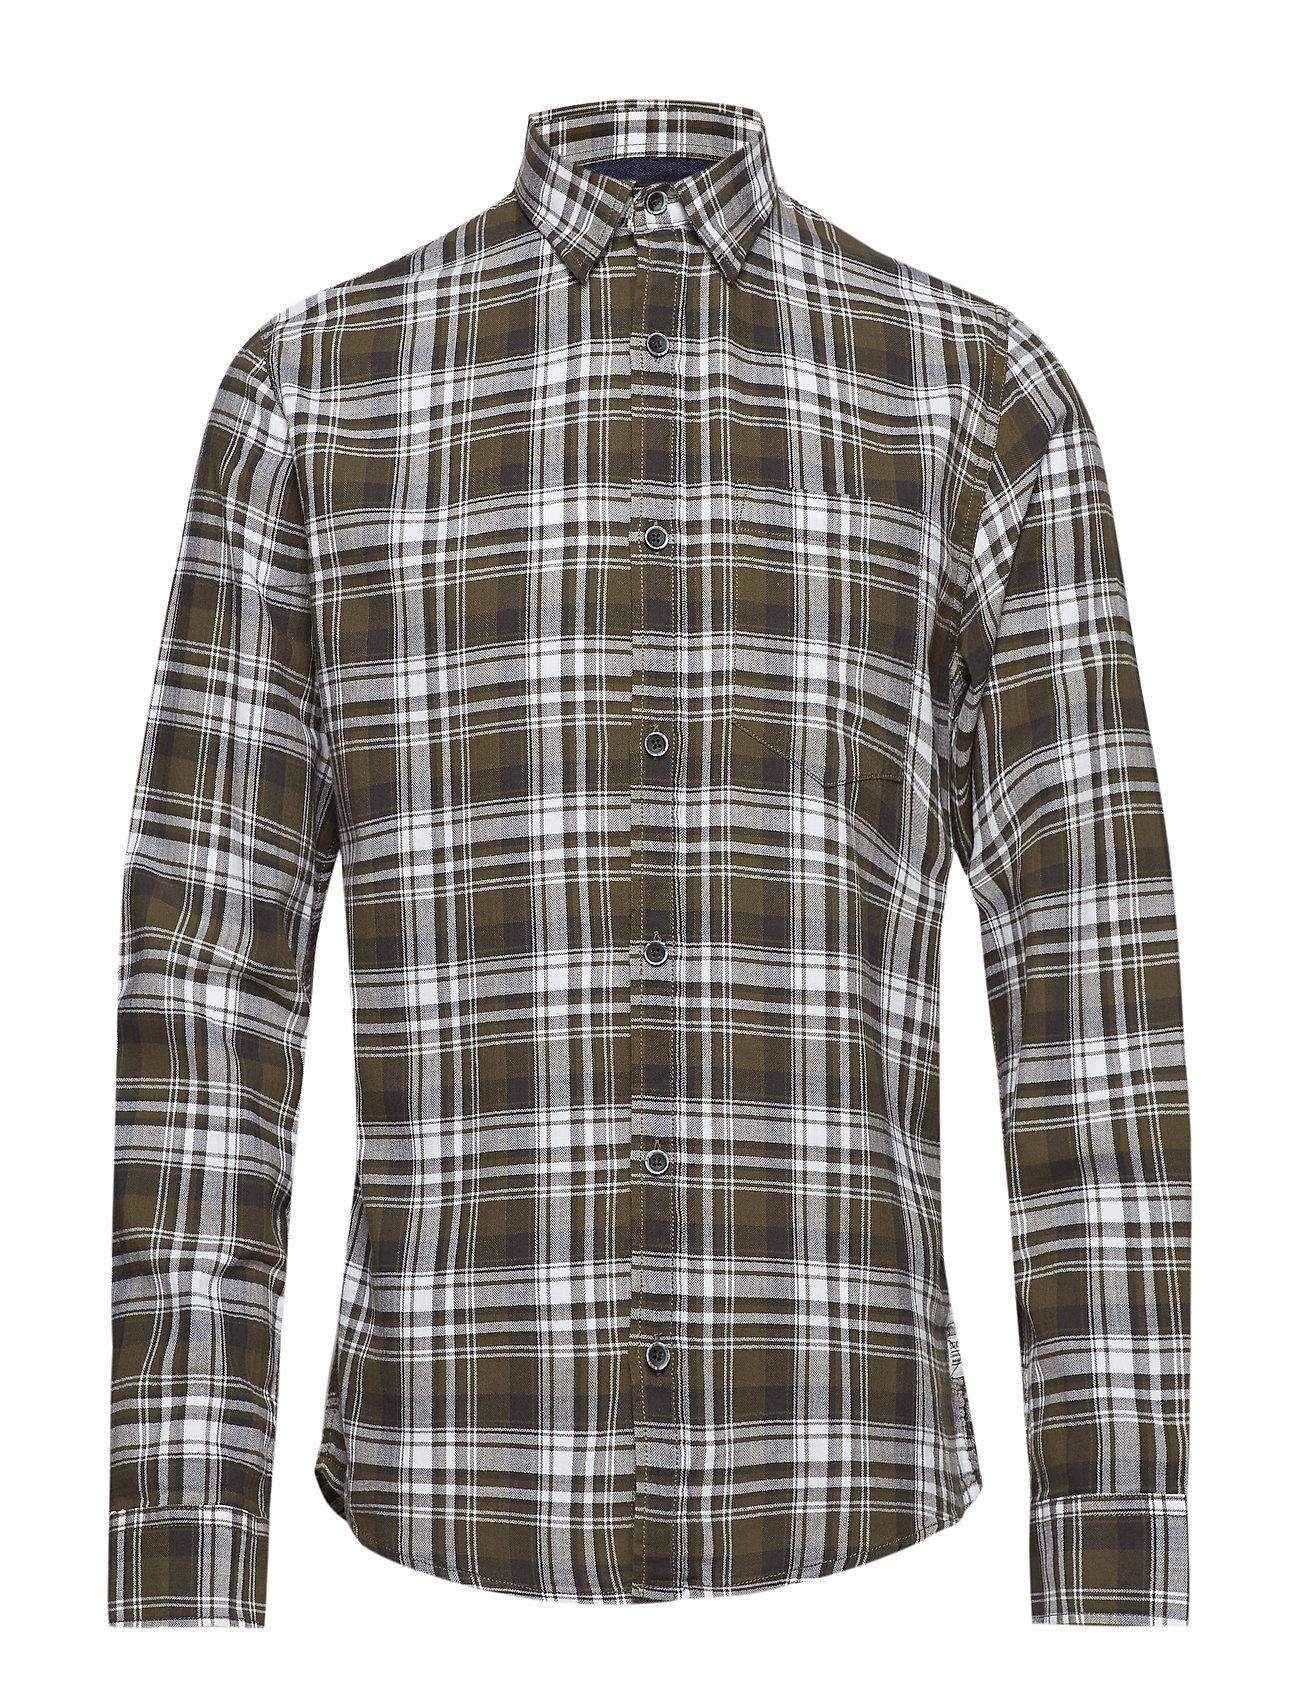 Shine Original Herringbone check shirt L/S